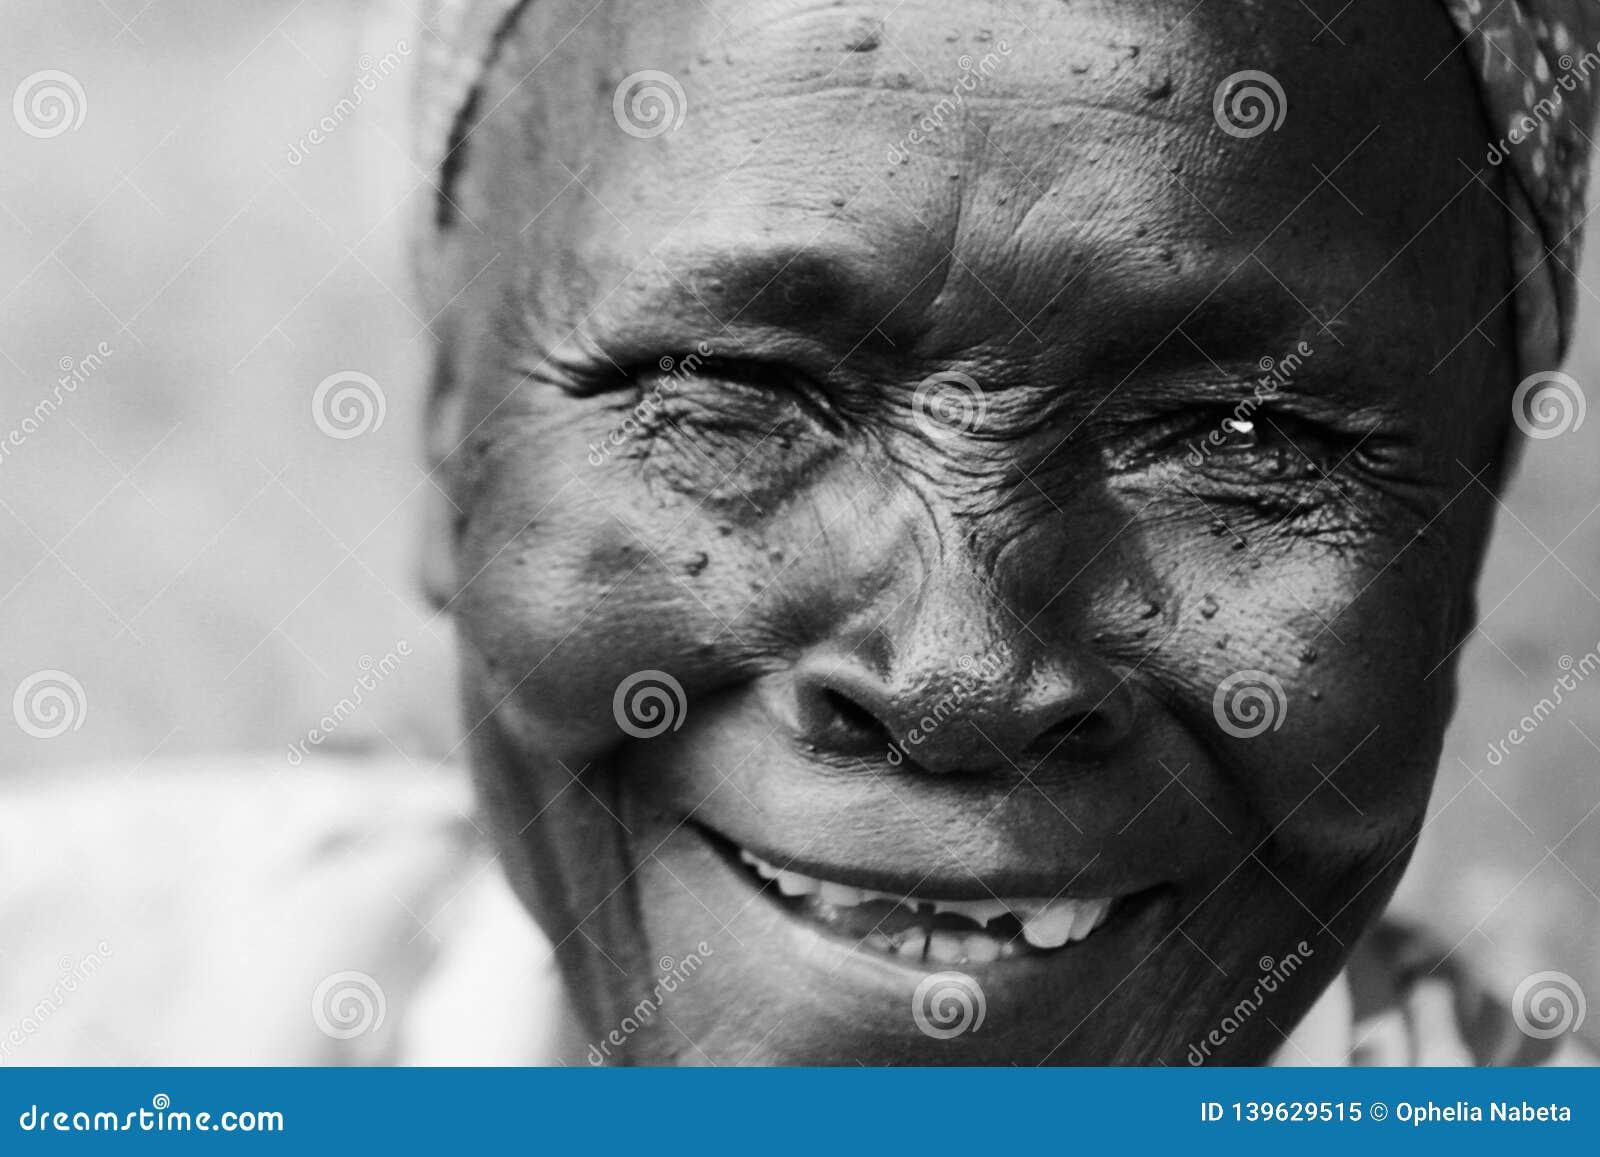 Bilder frau ohne zähne Frau zeigt